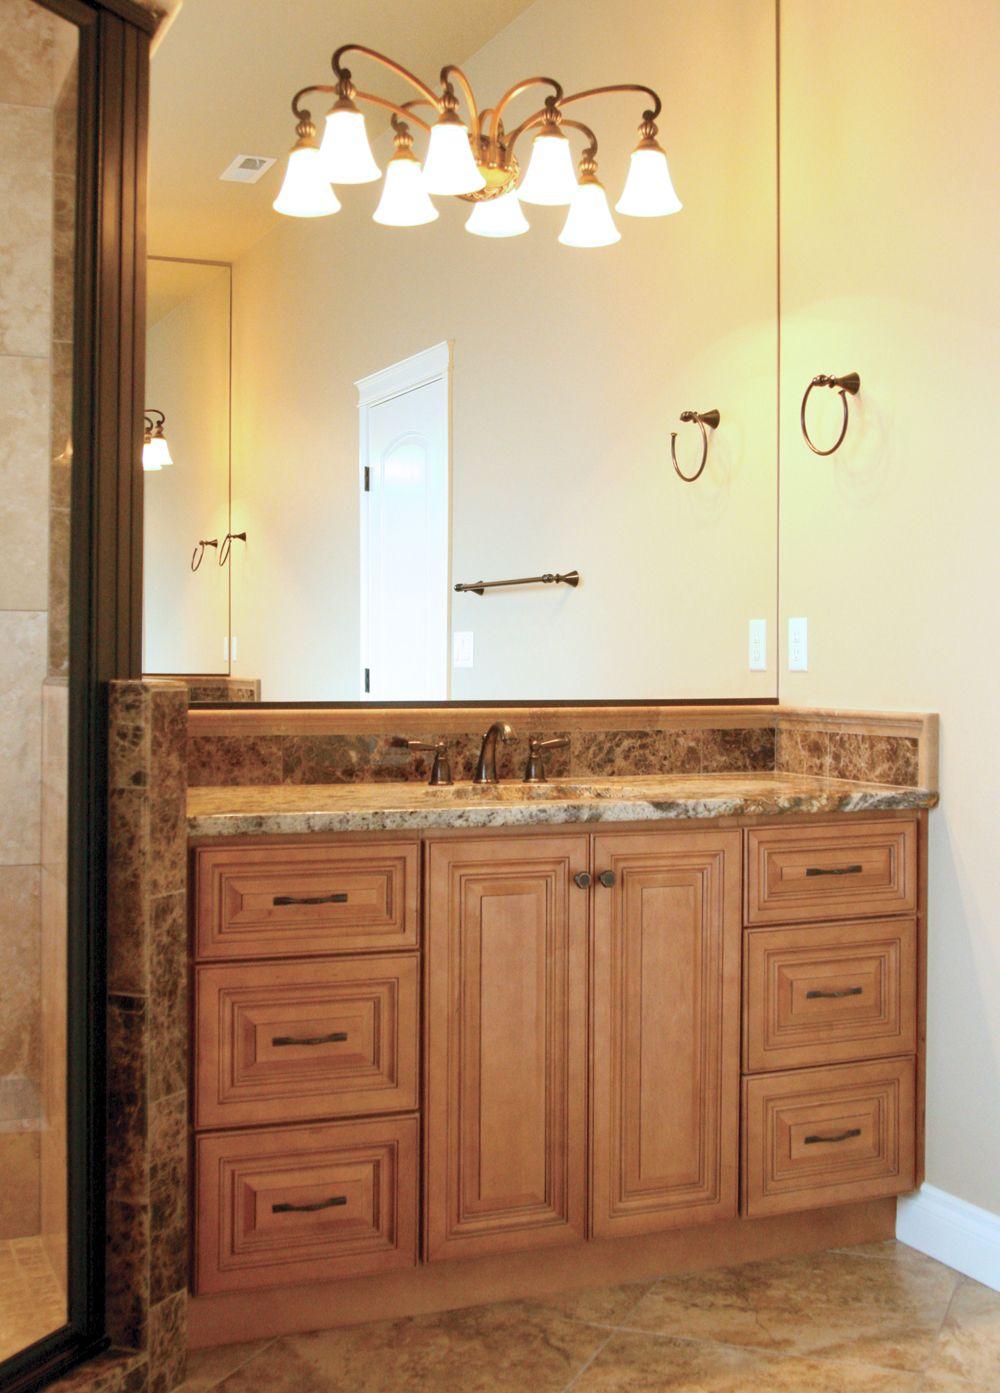 Cinnamon Maple Glazed Cabinet Grandjk Diy Kitchen Remodel New Kitchen Cabinets Kitchen Cabinet Design